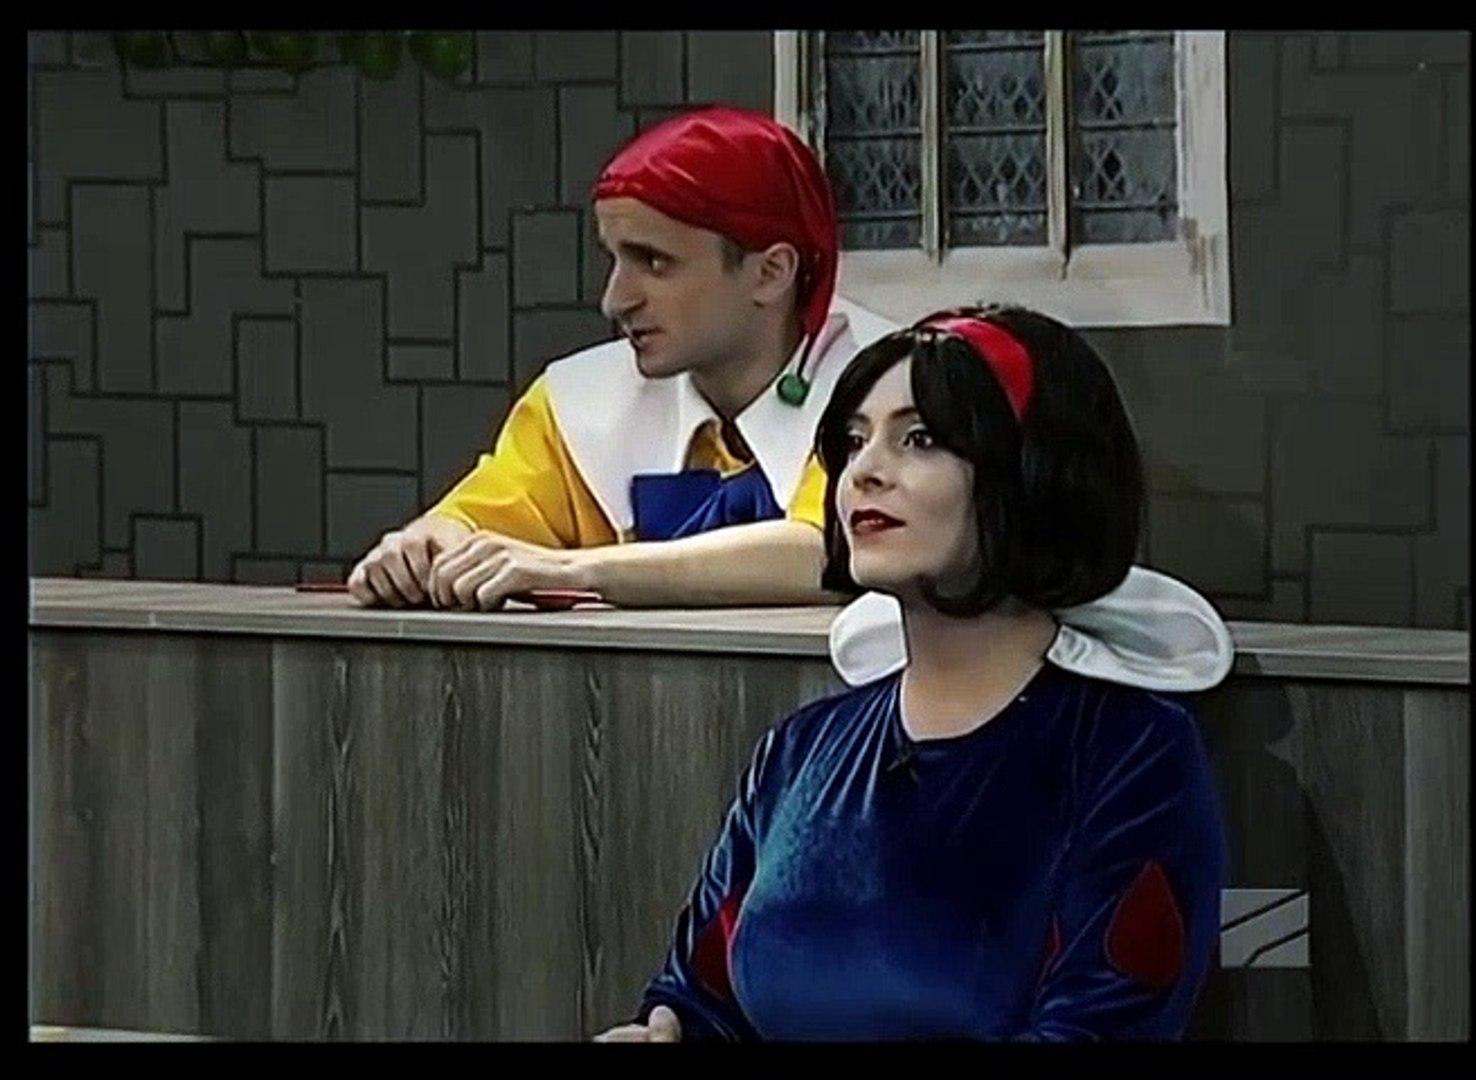 komedi gösterisi, sihirbaz okulu / komedi shou 24 marti jadoqrebis skola